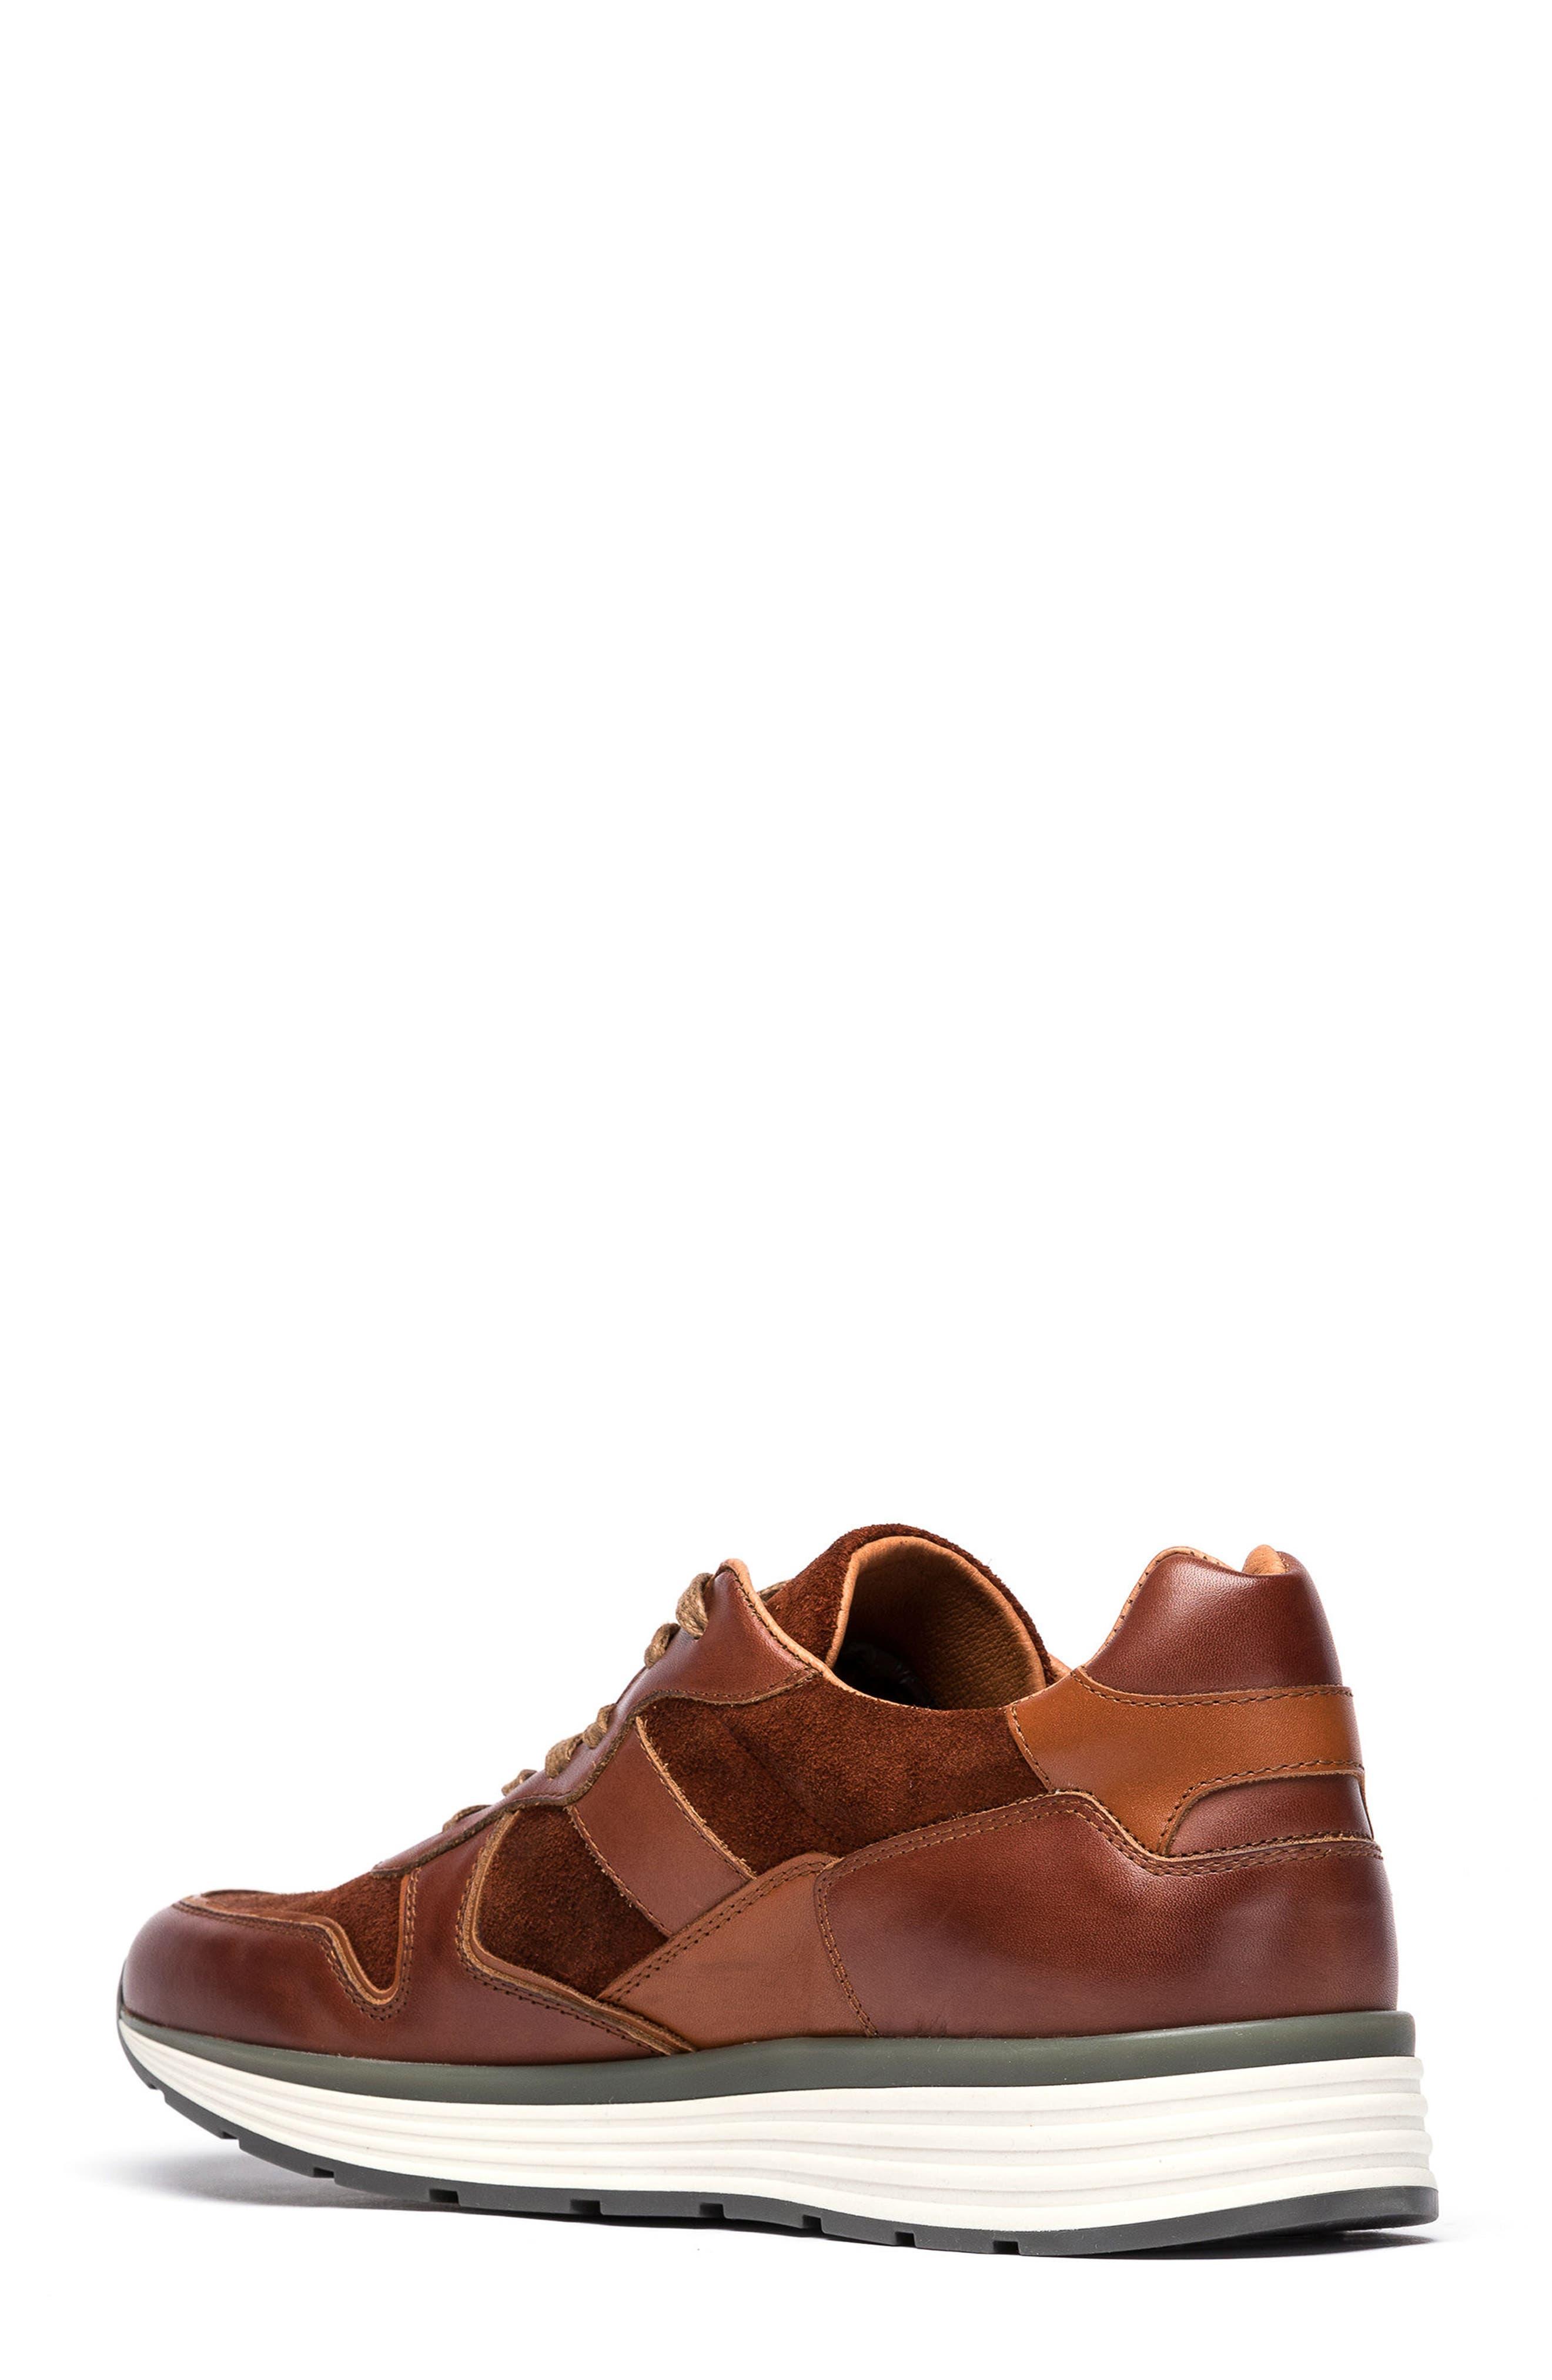 Hickory Sneaker,                             Alternate thumbnail 2, color,                             208